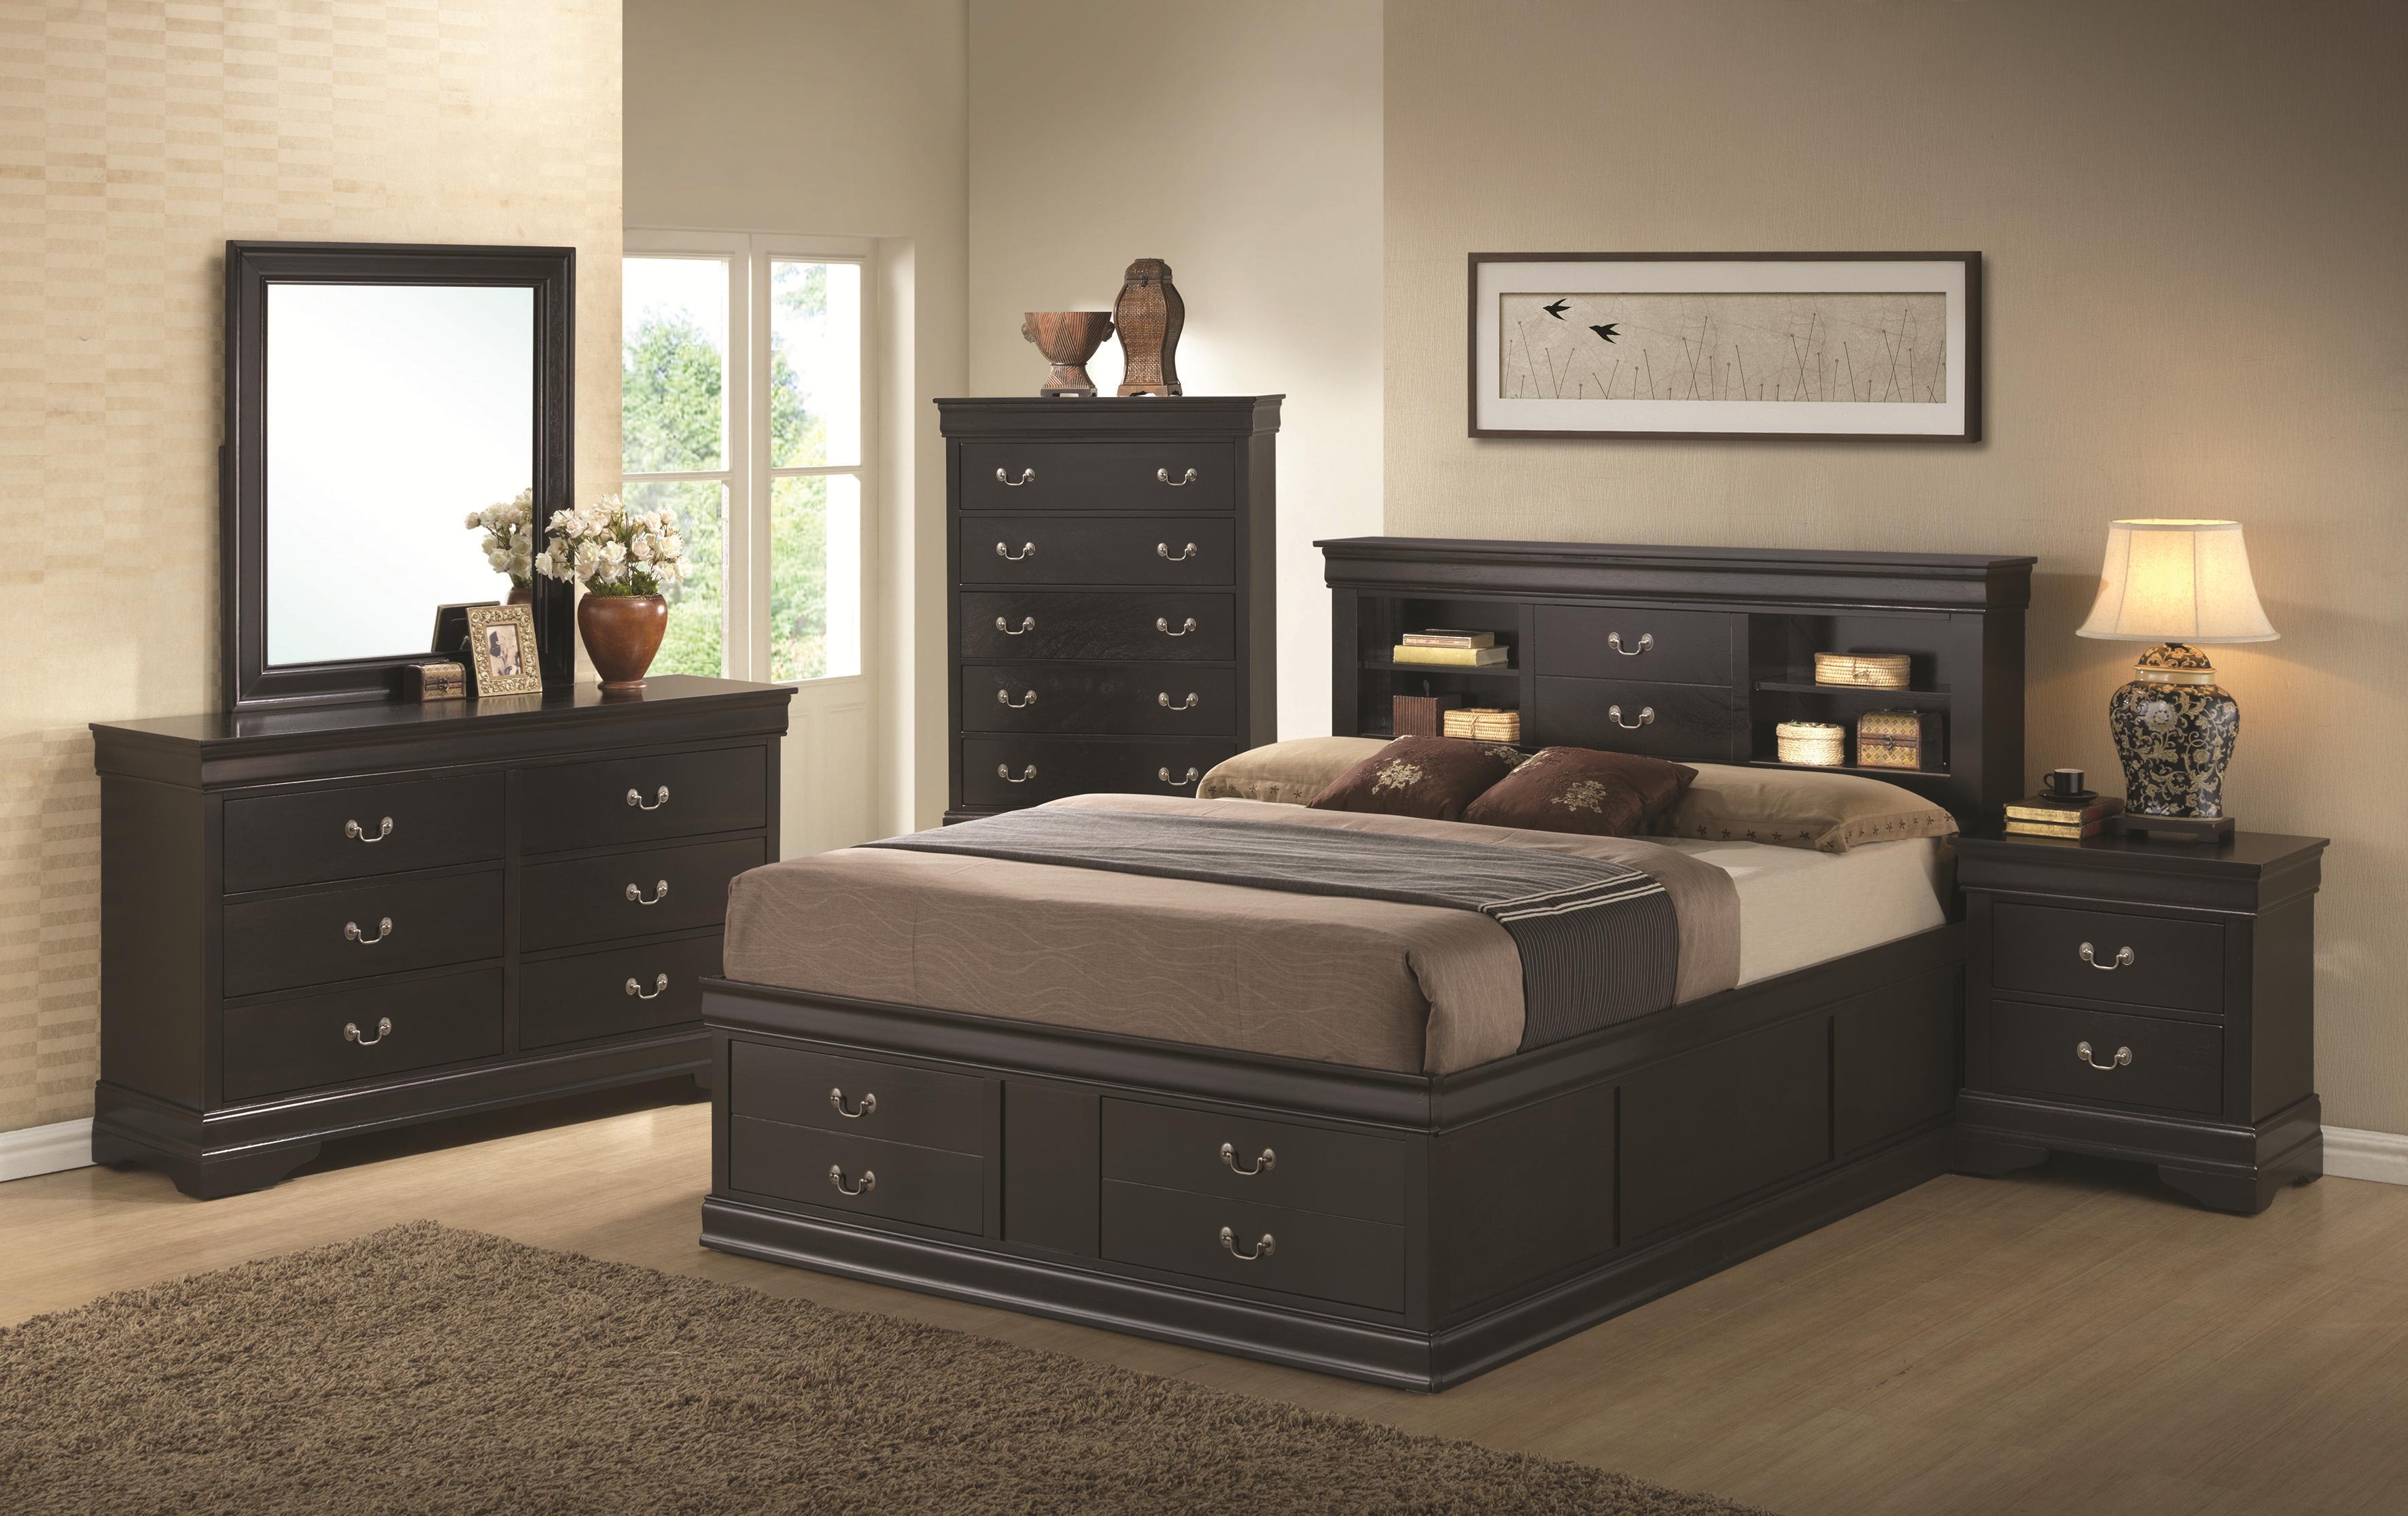 Coaster Furniture - Louis Philippe - Bedroom Set | Broadway Furniture